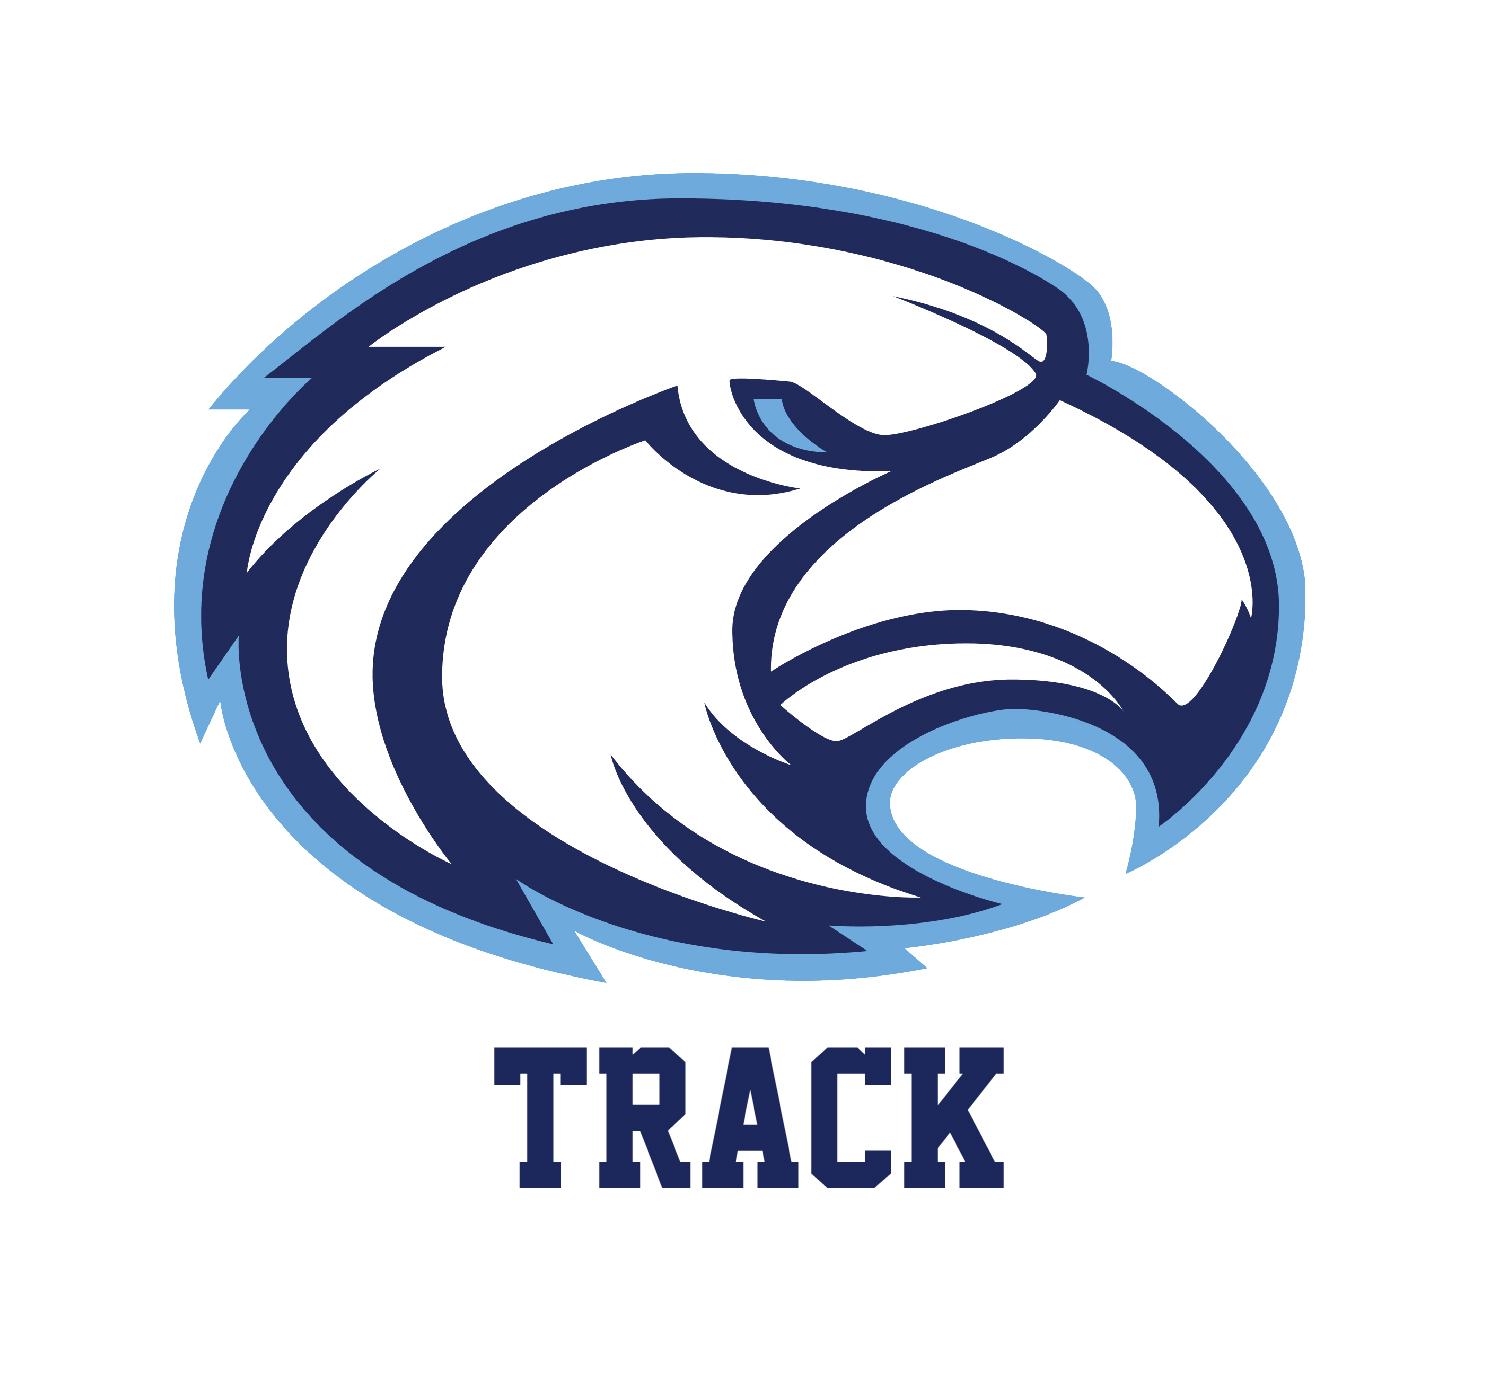 2021 Track Coaching Staff and Season Information